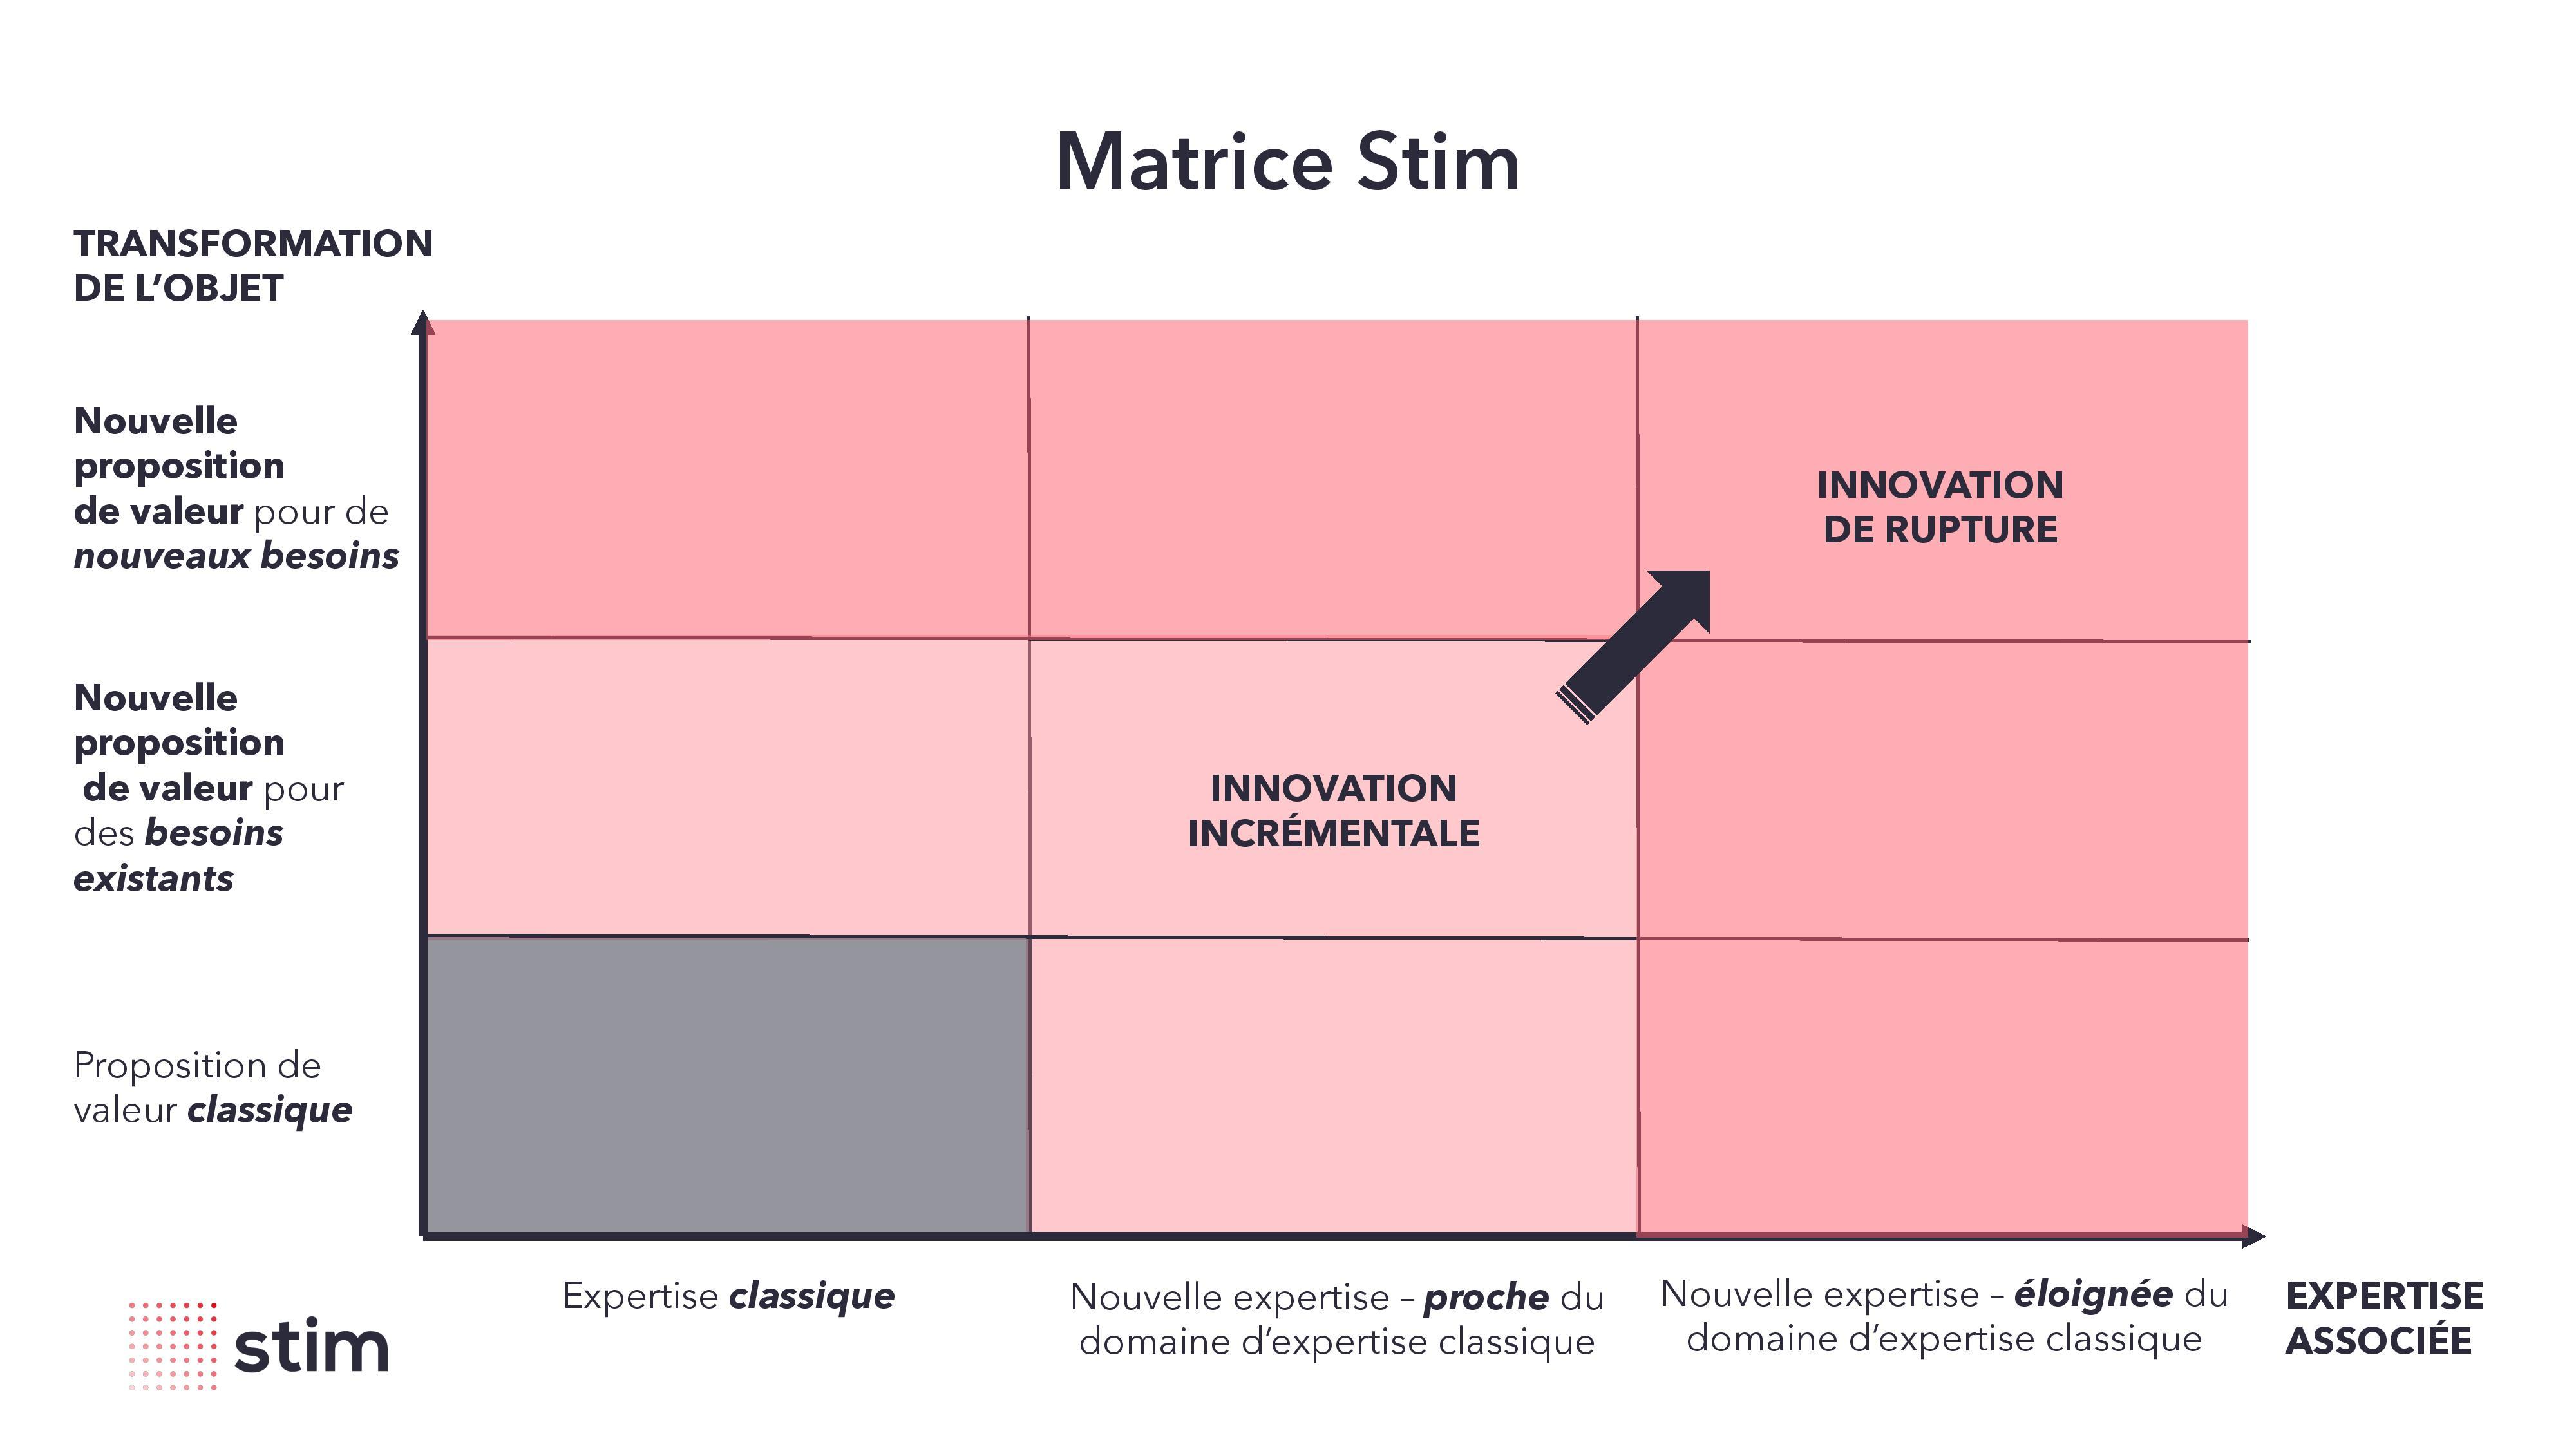 Matrice Stim, stratégie d'innovation